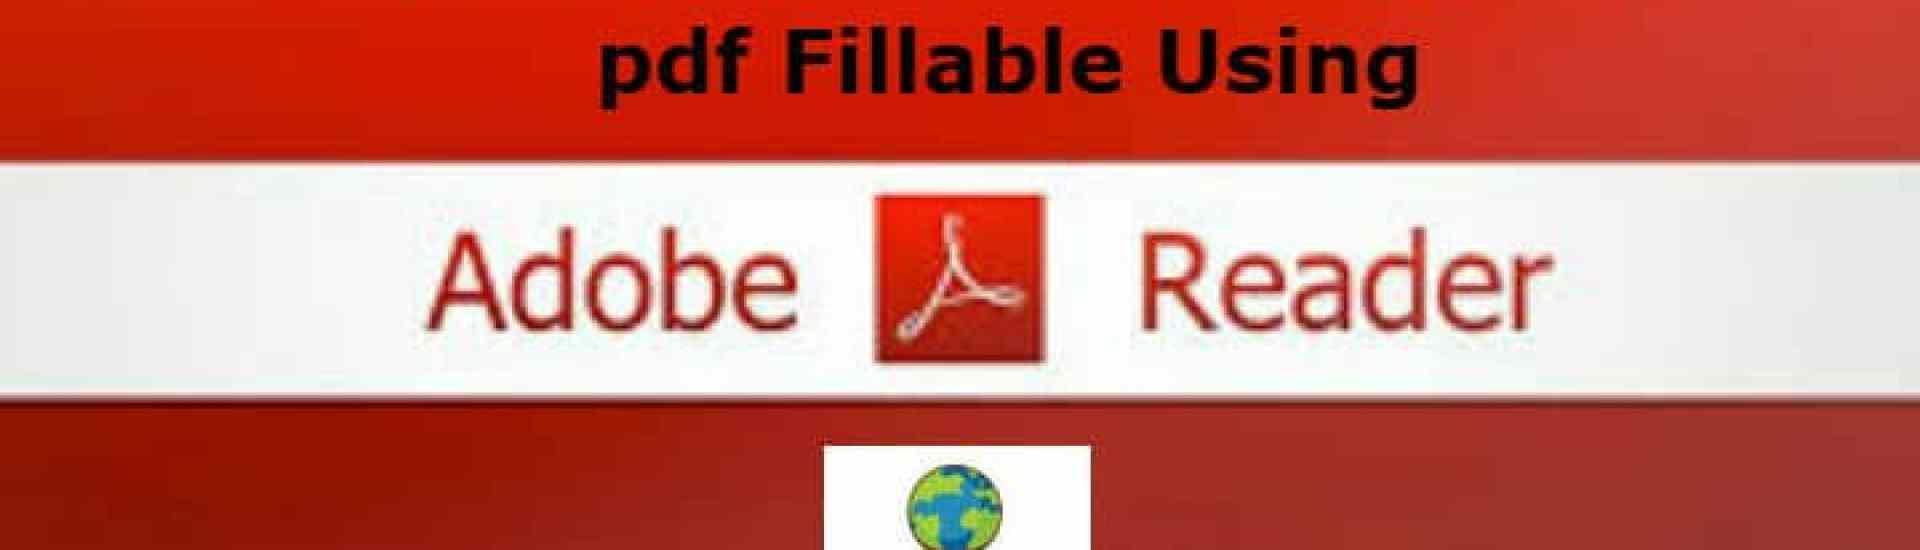 uscis visa application forms pdf fillable using adobe acrobat reader